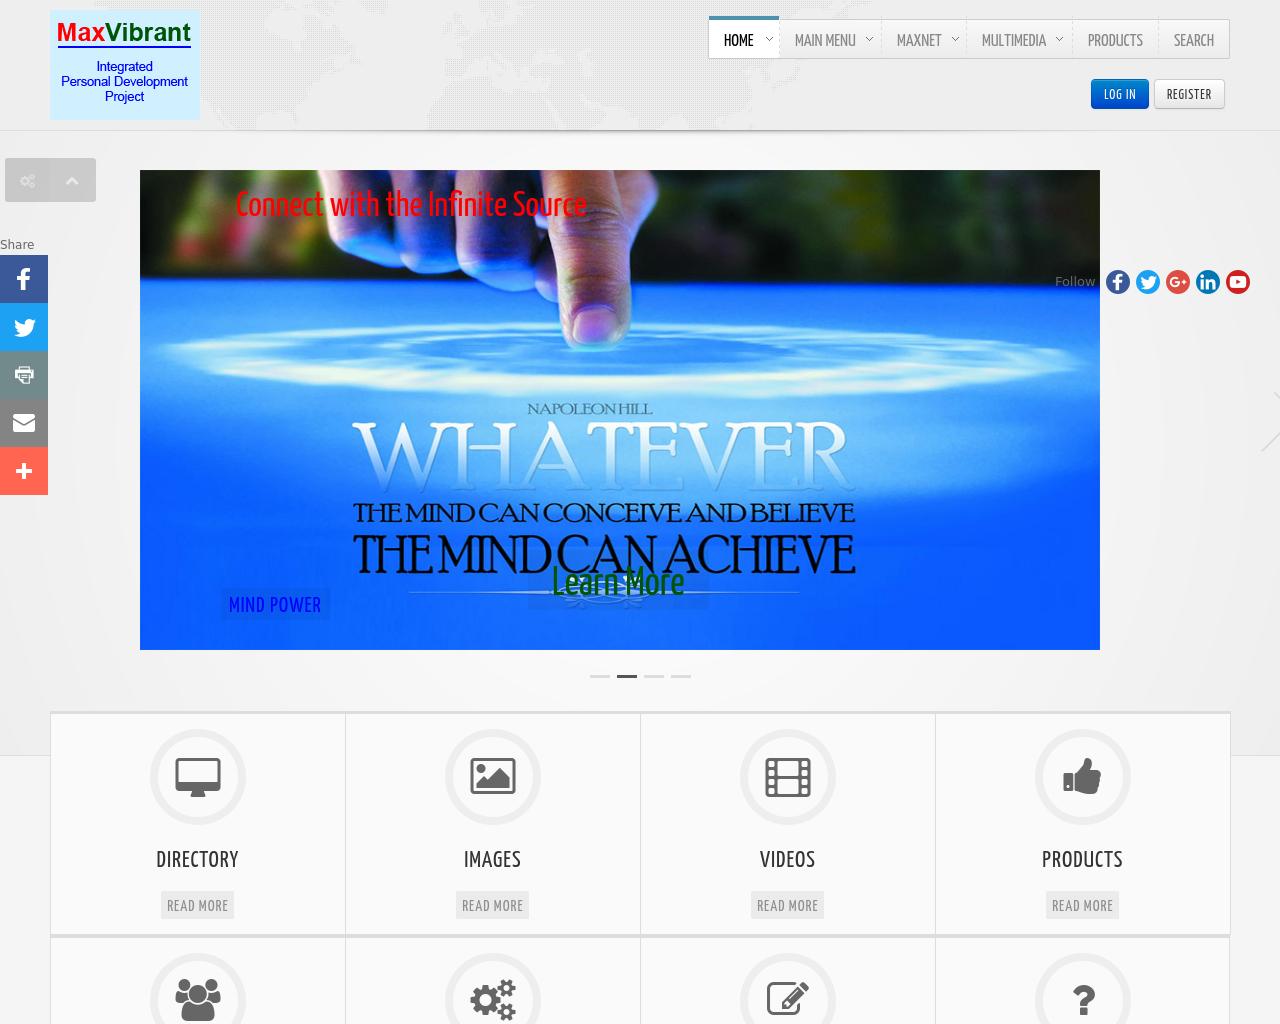 MaxVibrant-Advertising-Reviews-Pricing